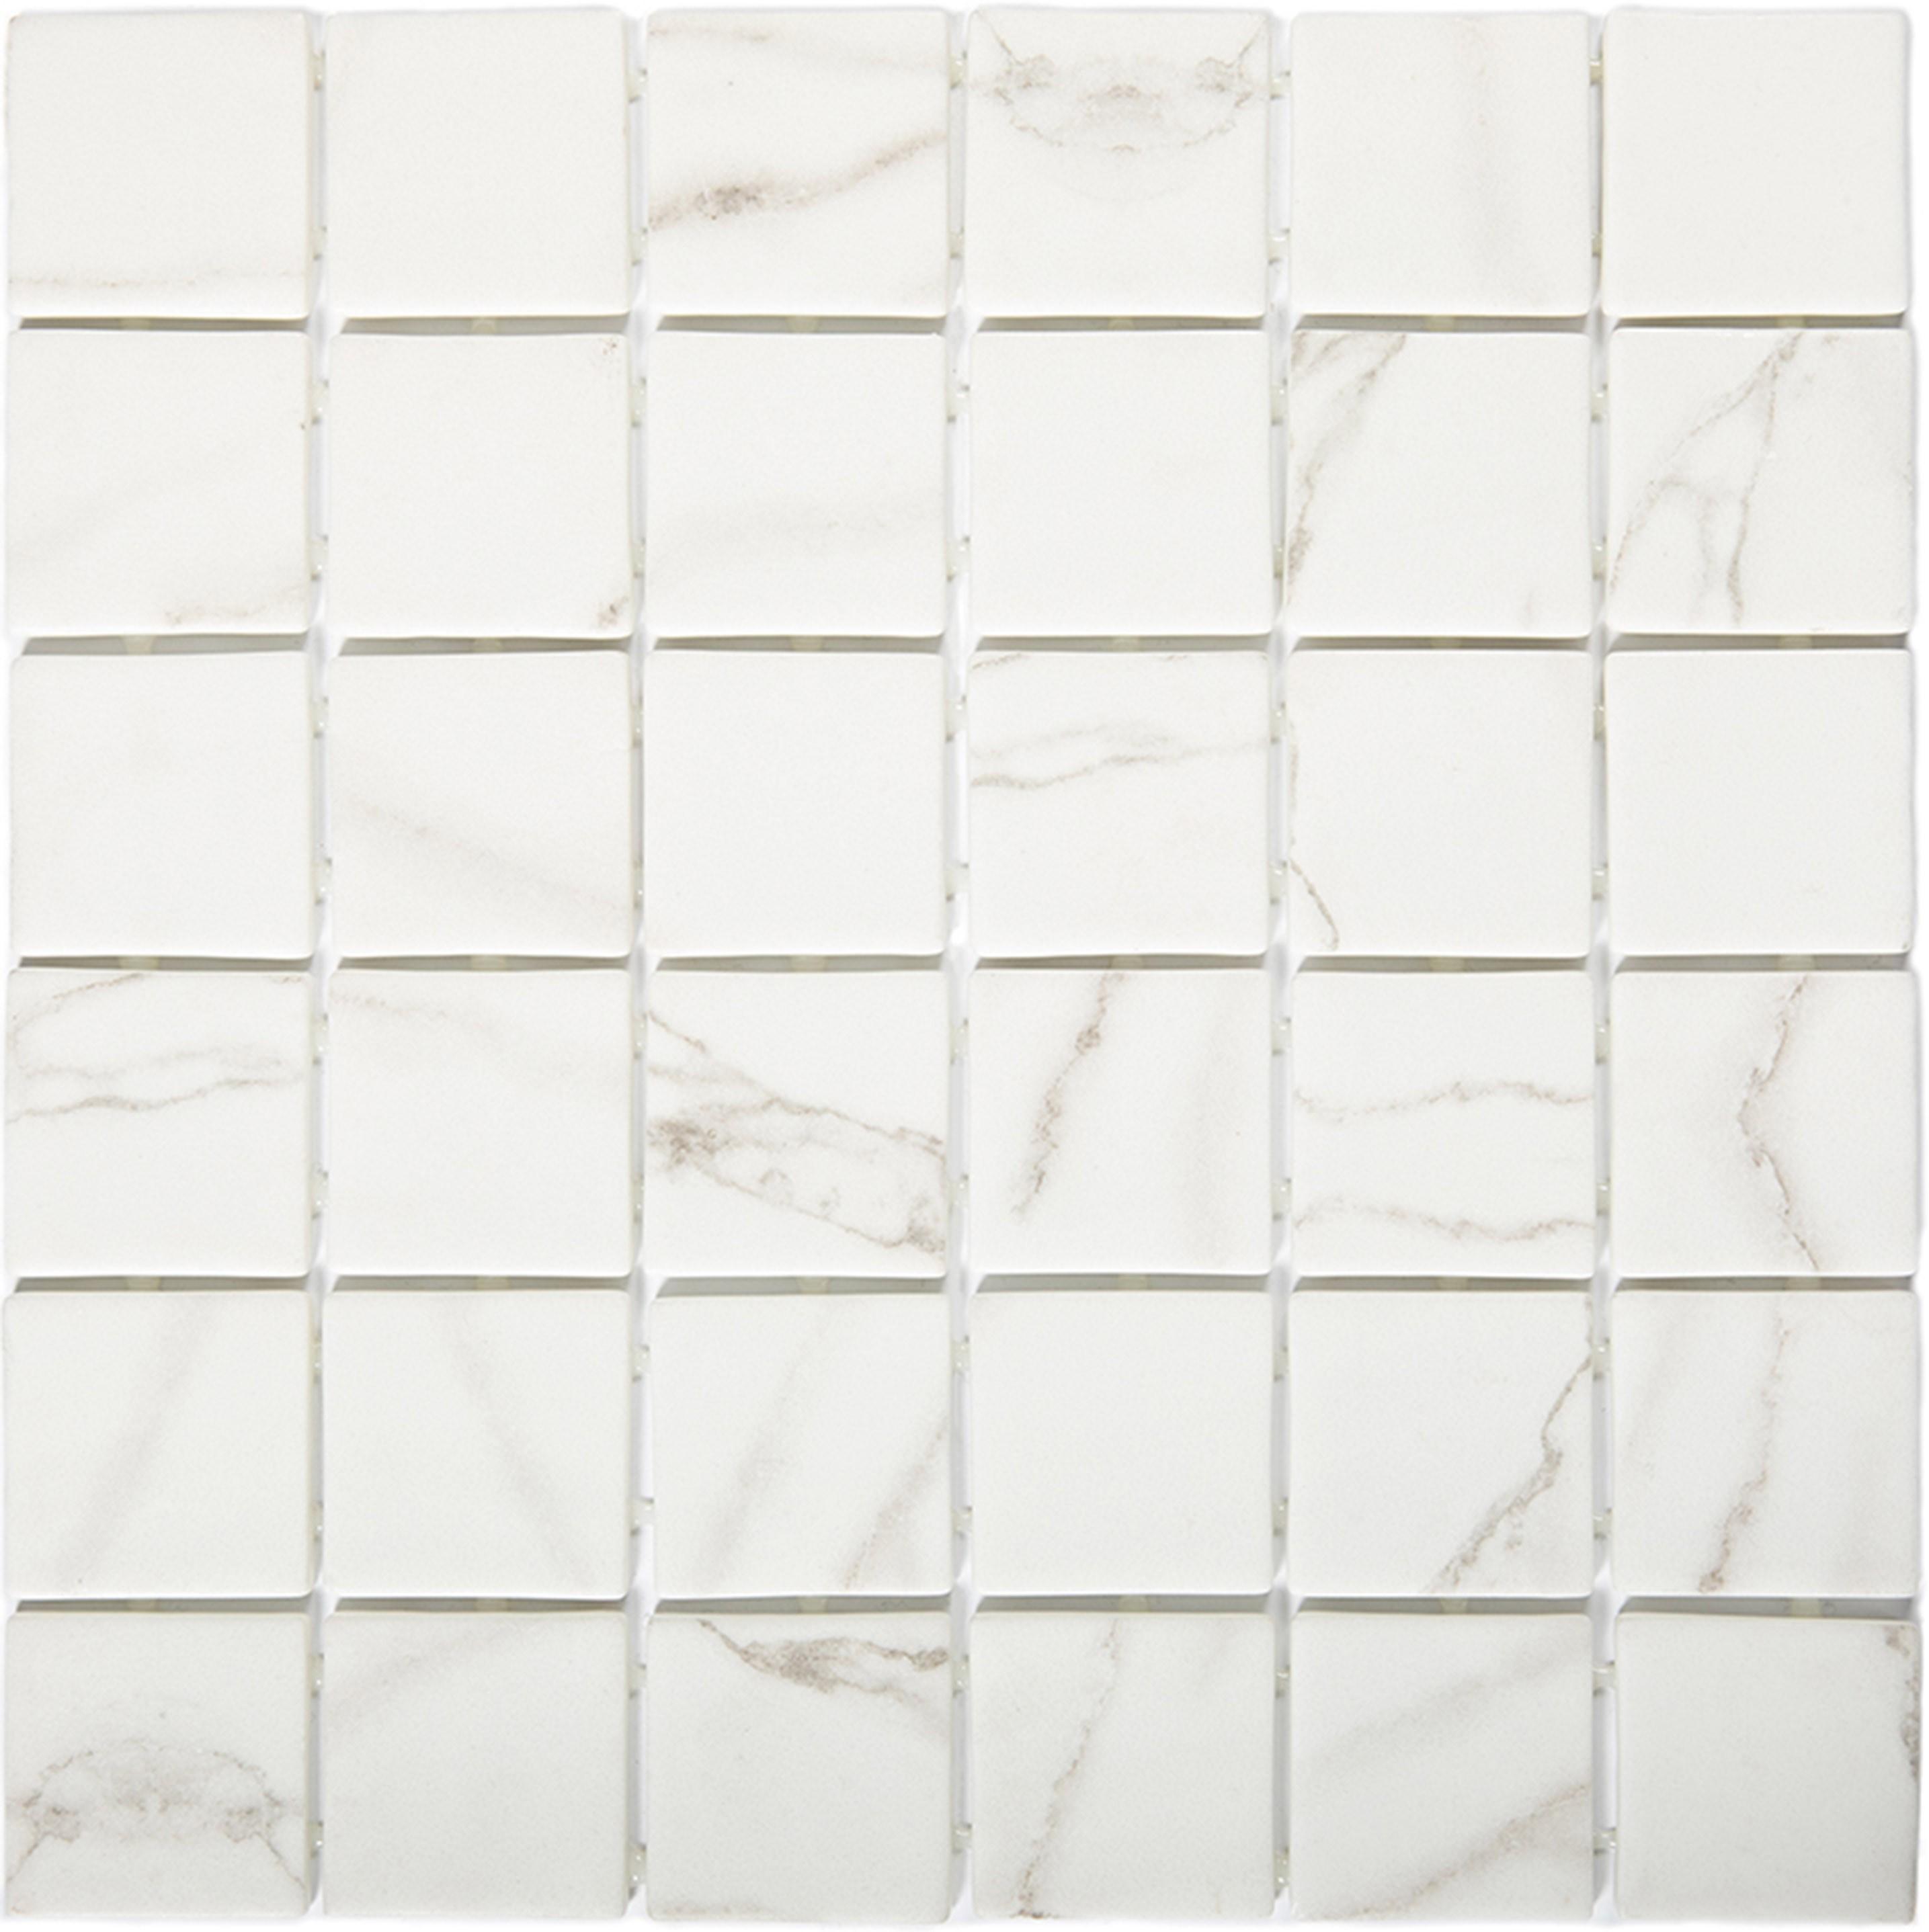 Pool-Tiles Hero Onix Era-hero-gallery-2